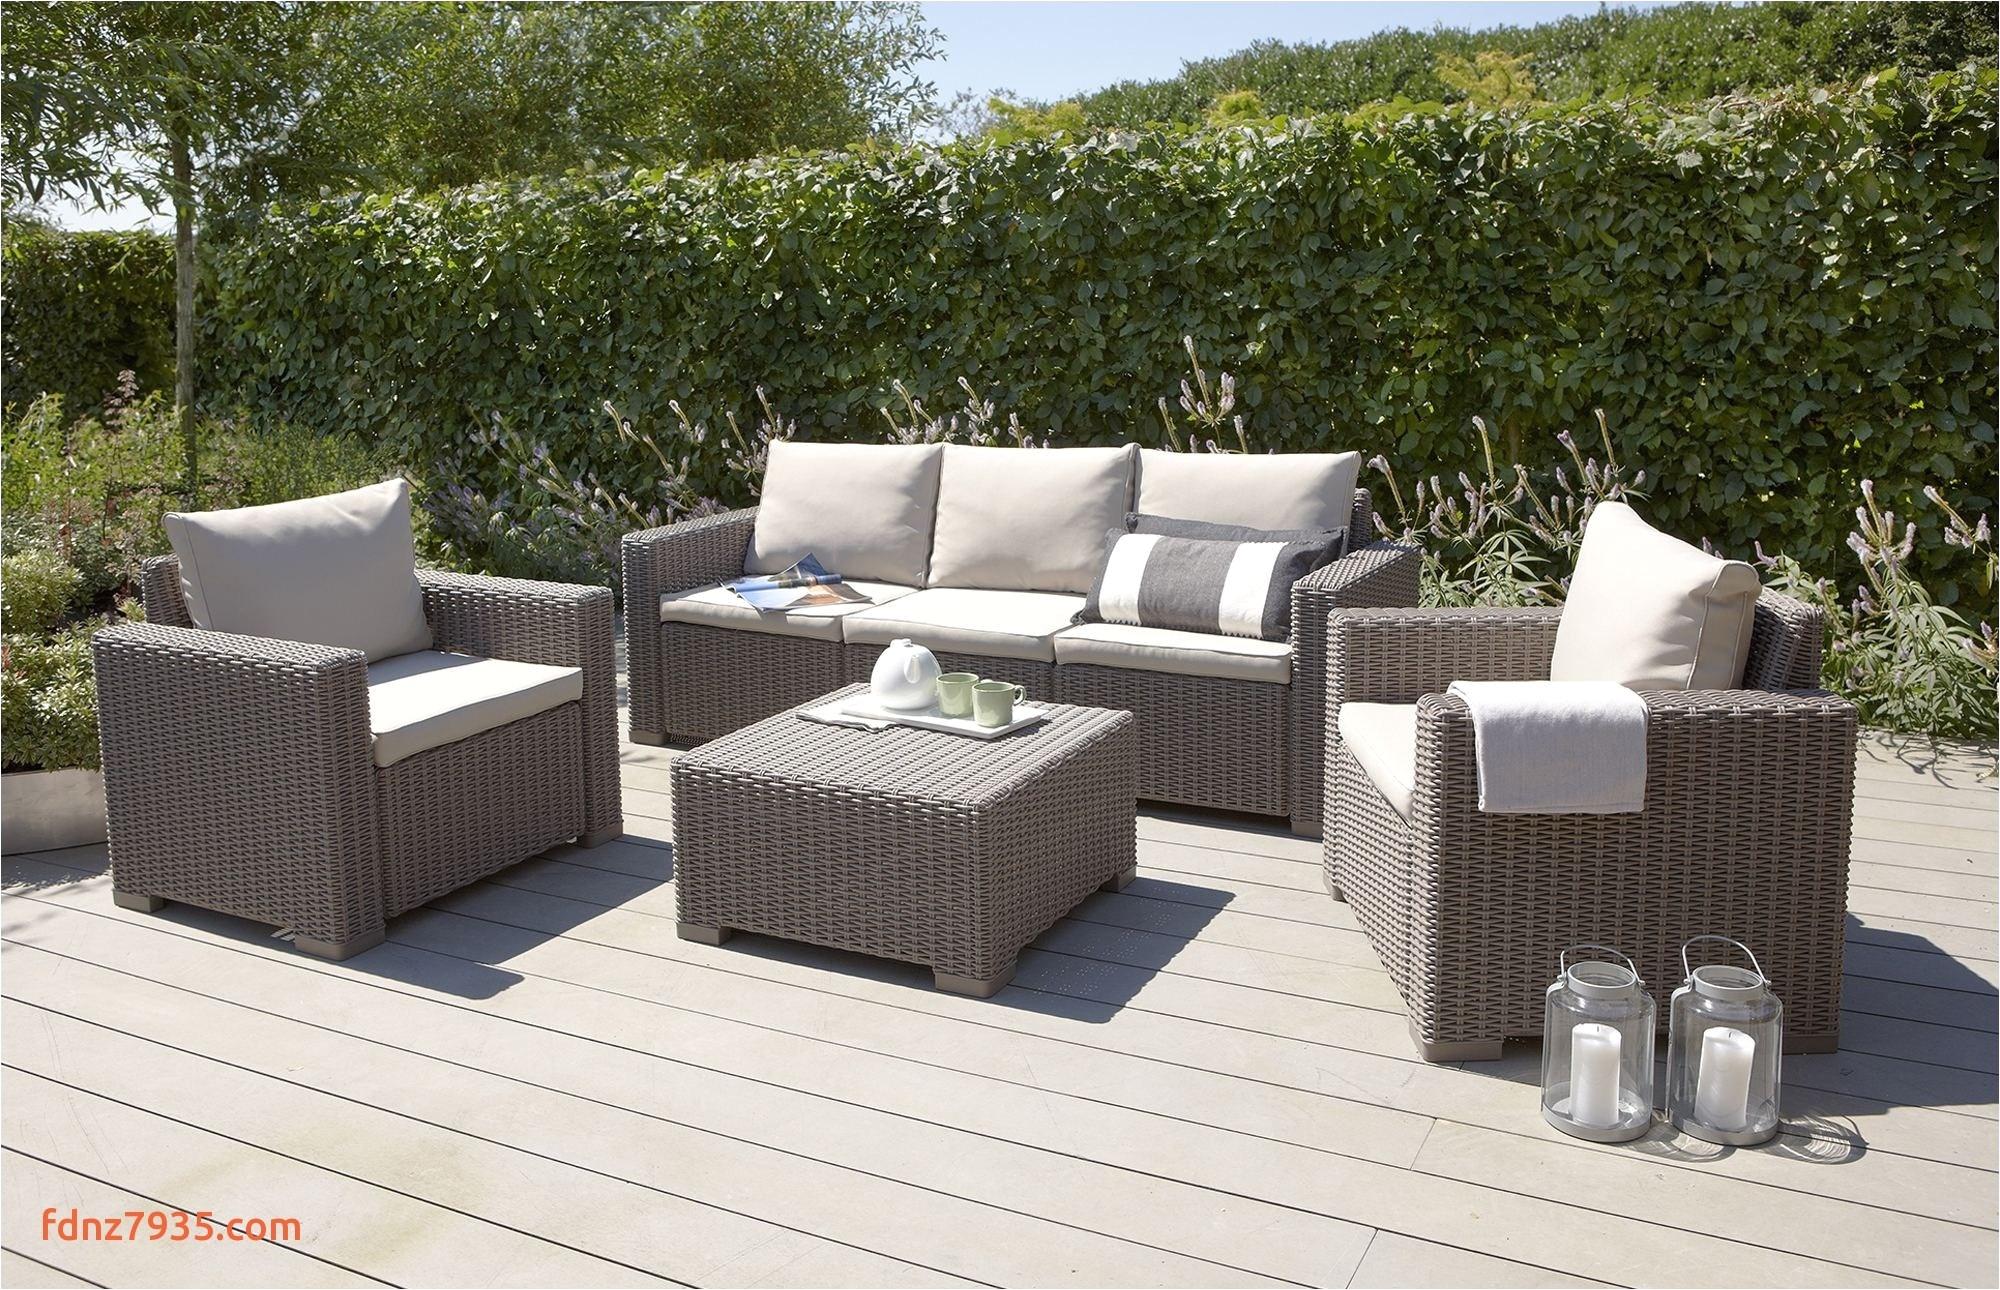 0d chairs house beautiful outdoor furniture sale costco garden gorgeous impressive patio costco outdoor furniture sale